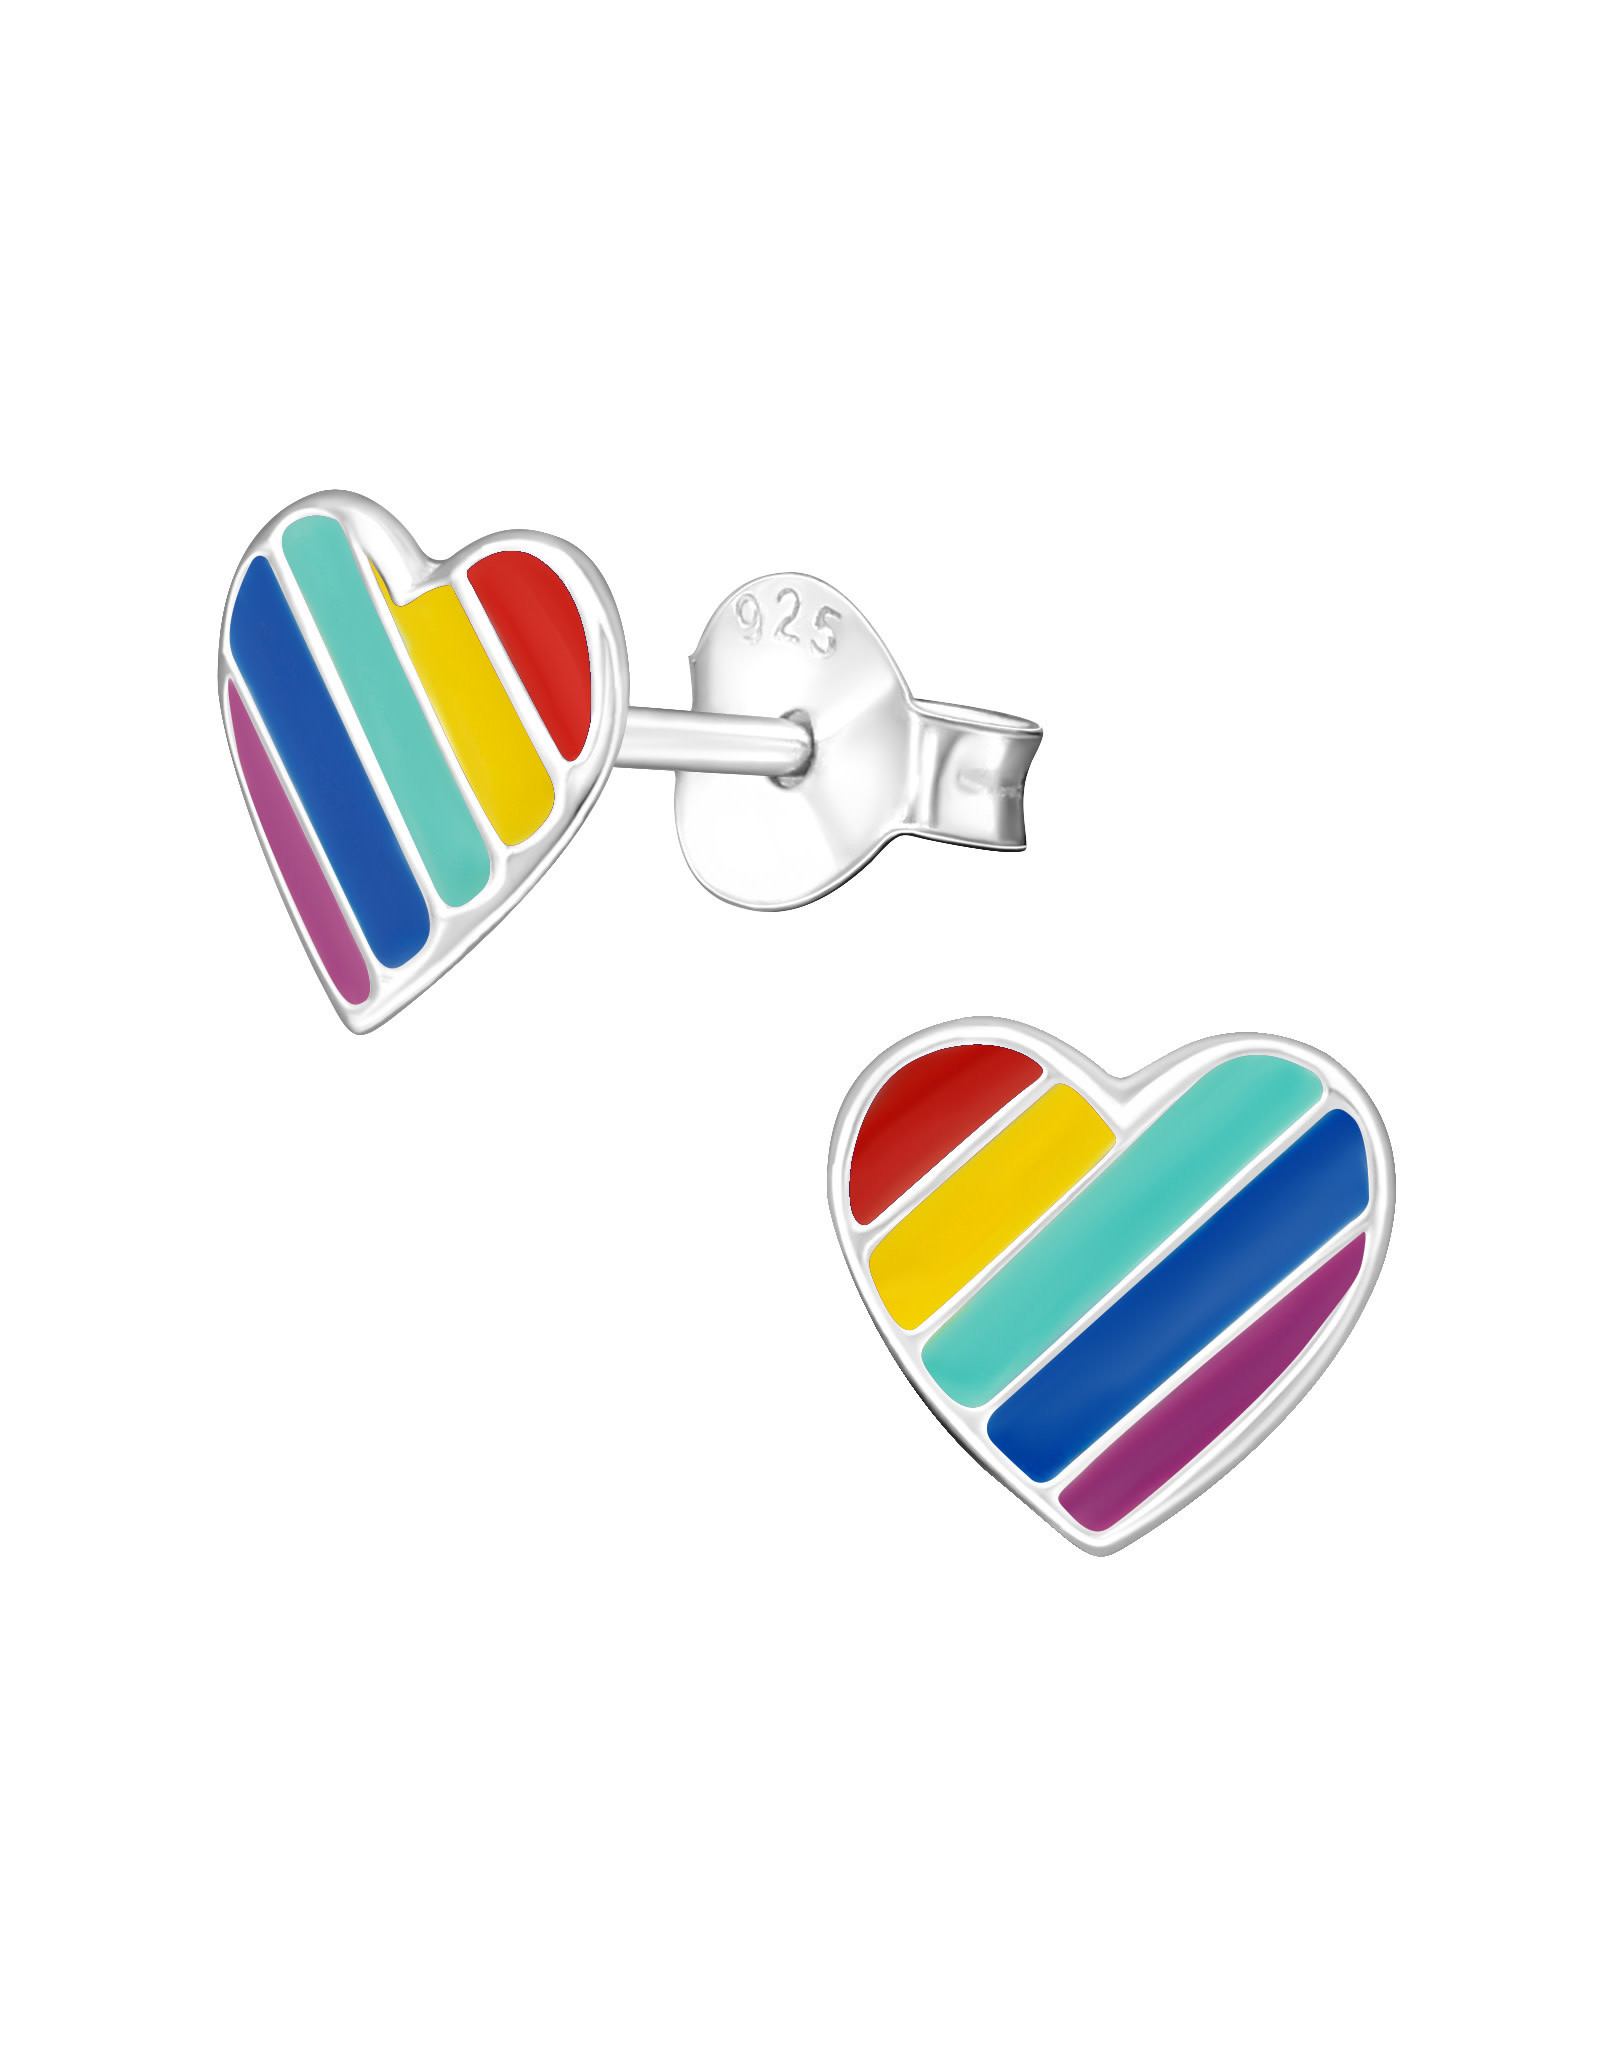 Stekertjes zilver hart regenboog